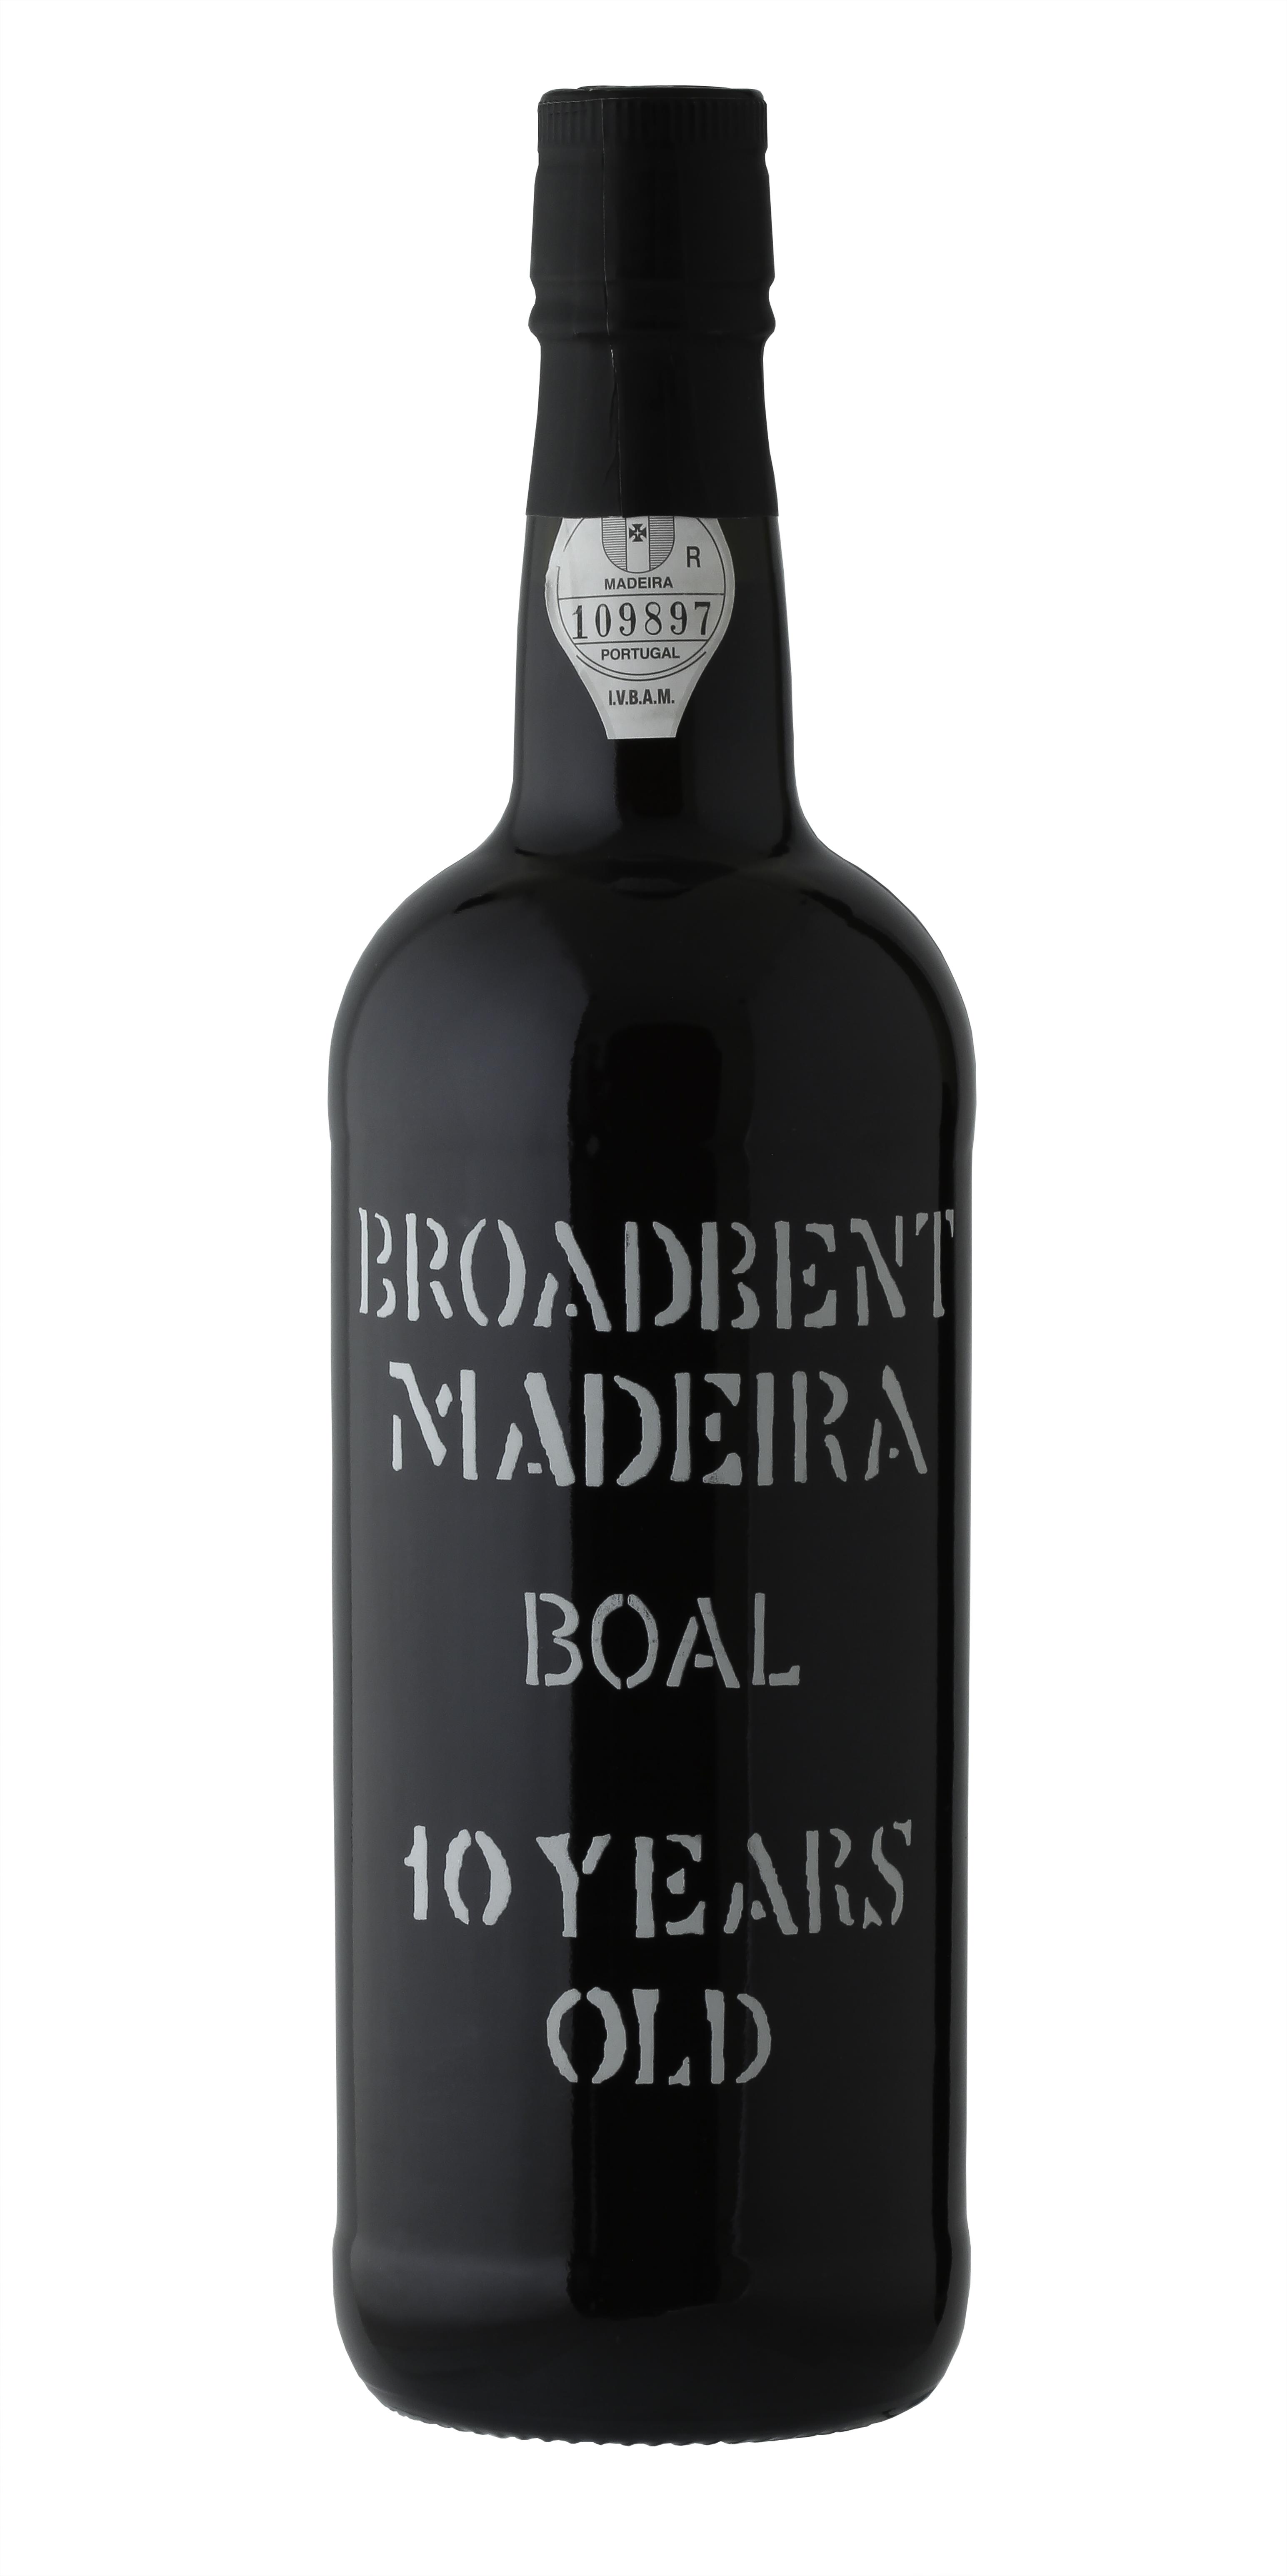 Broadbent 10 year Boal